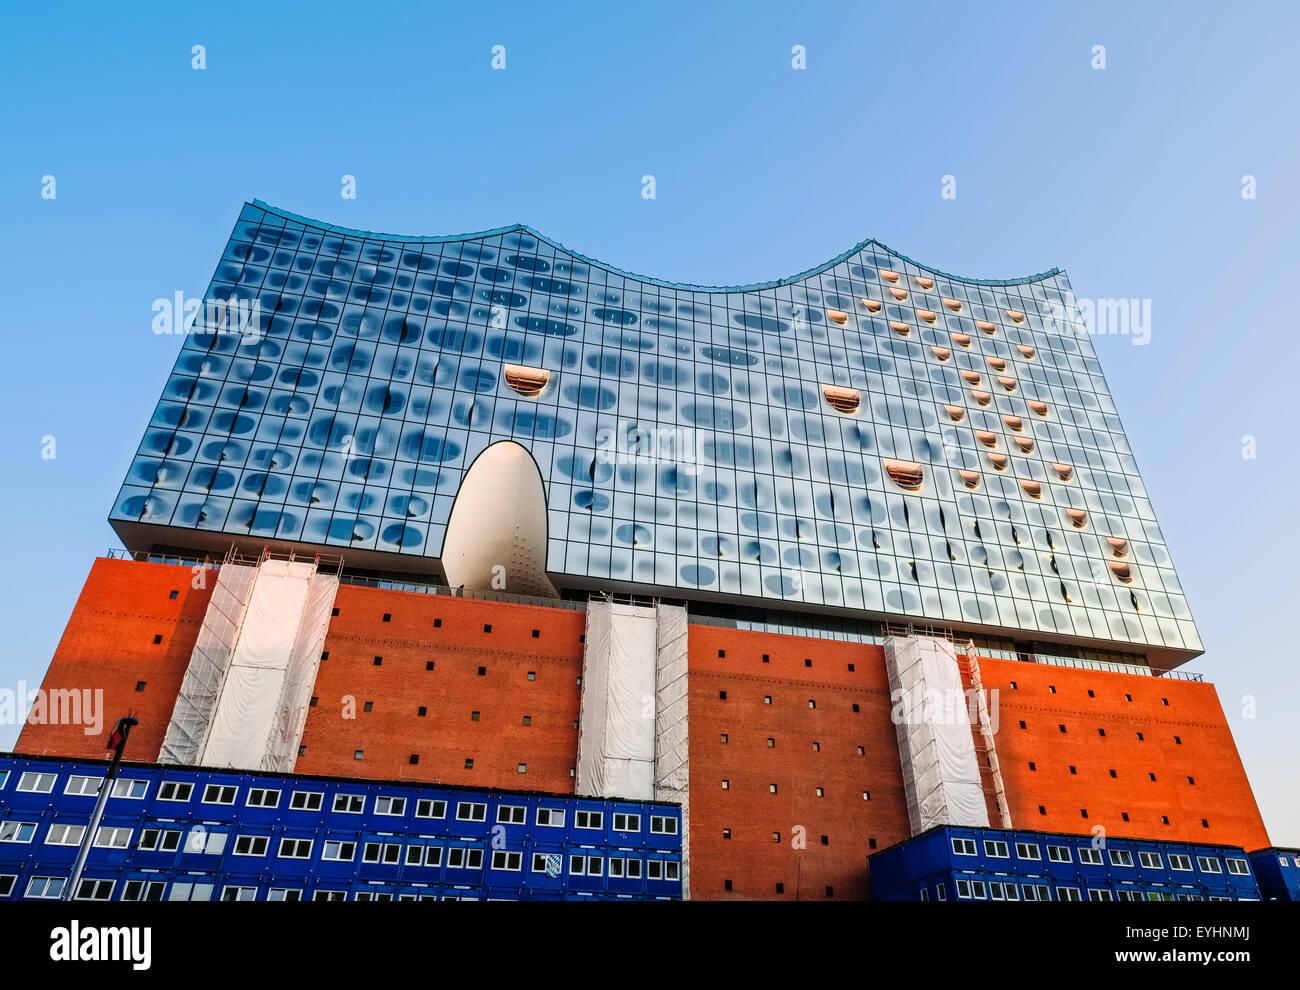 Elbe Philharmonic Hall in the HafenCity quarter, Hamburg, Germany Stock Photo